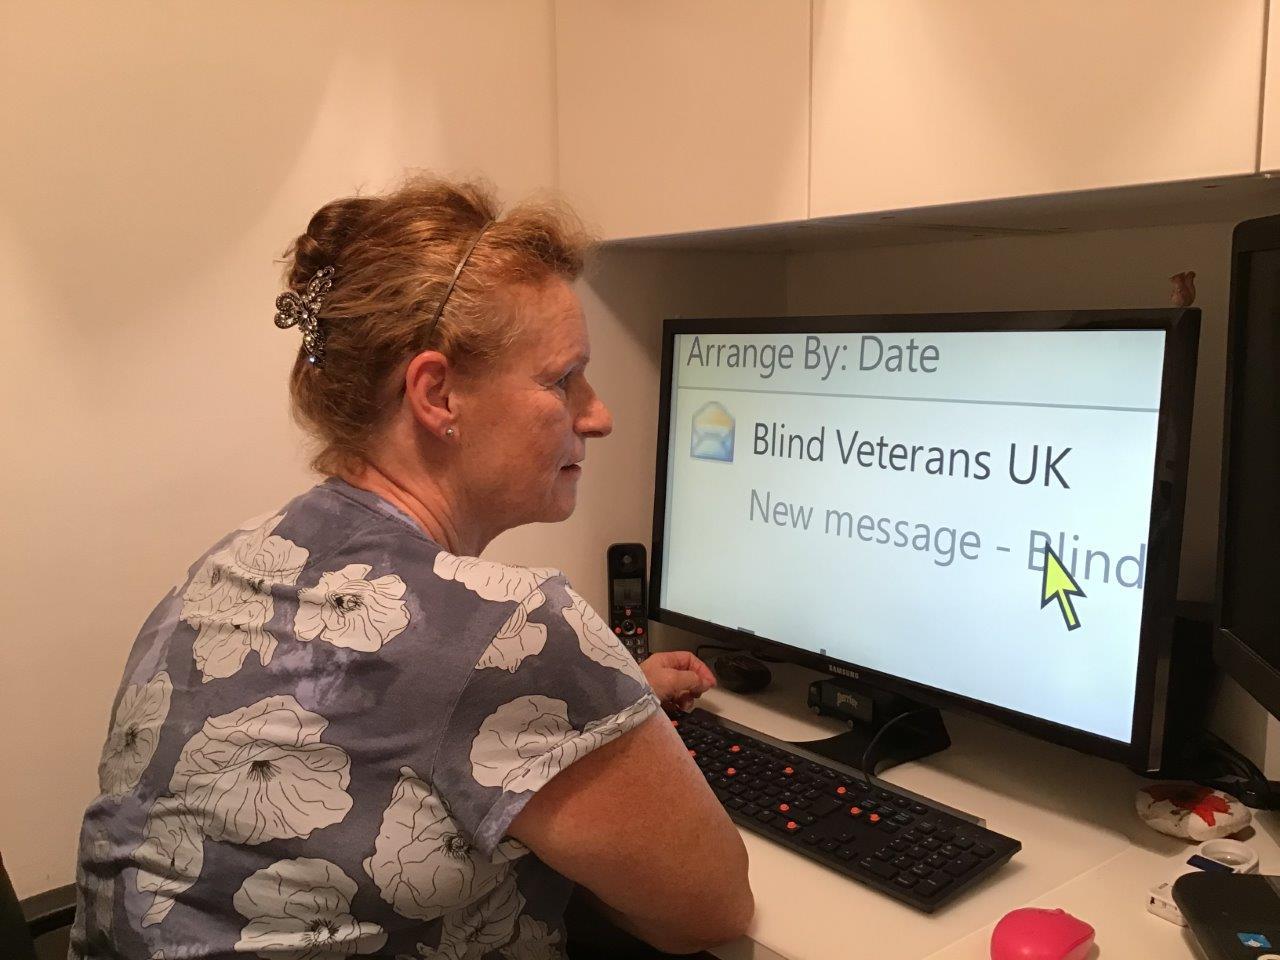 veteran using a computer